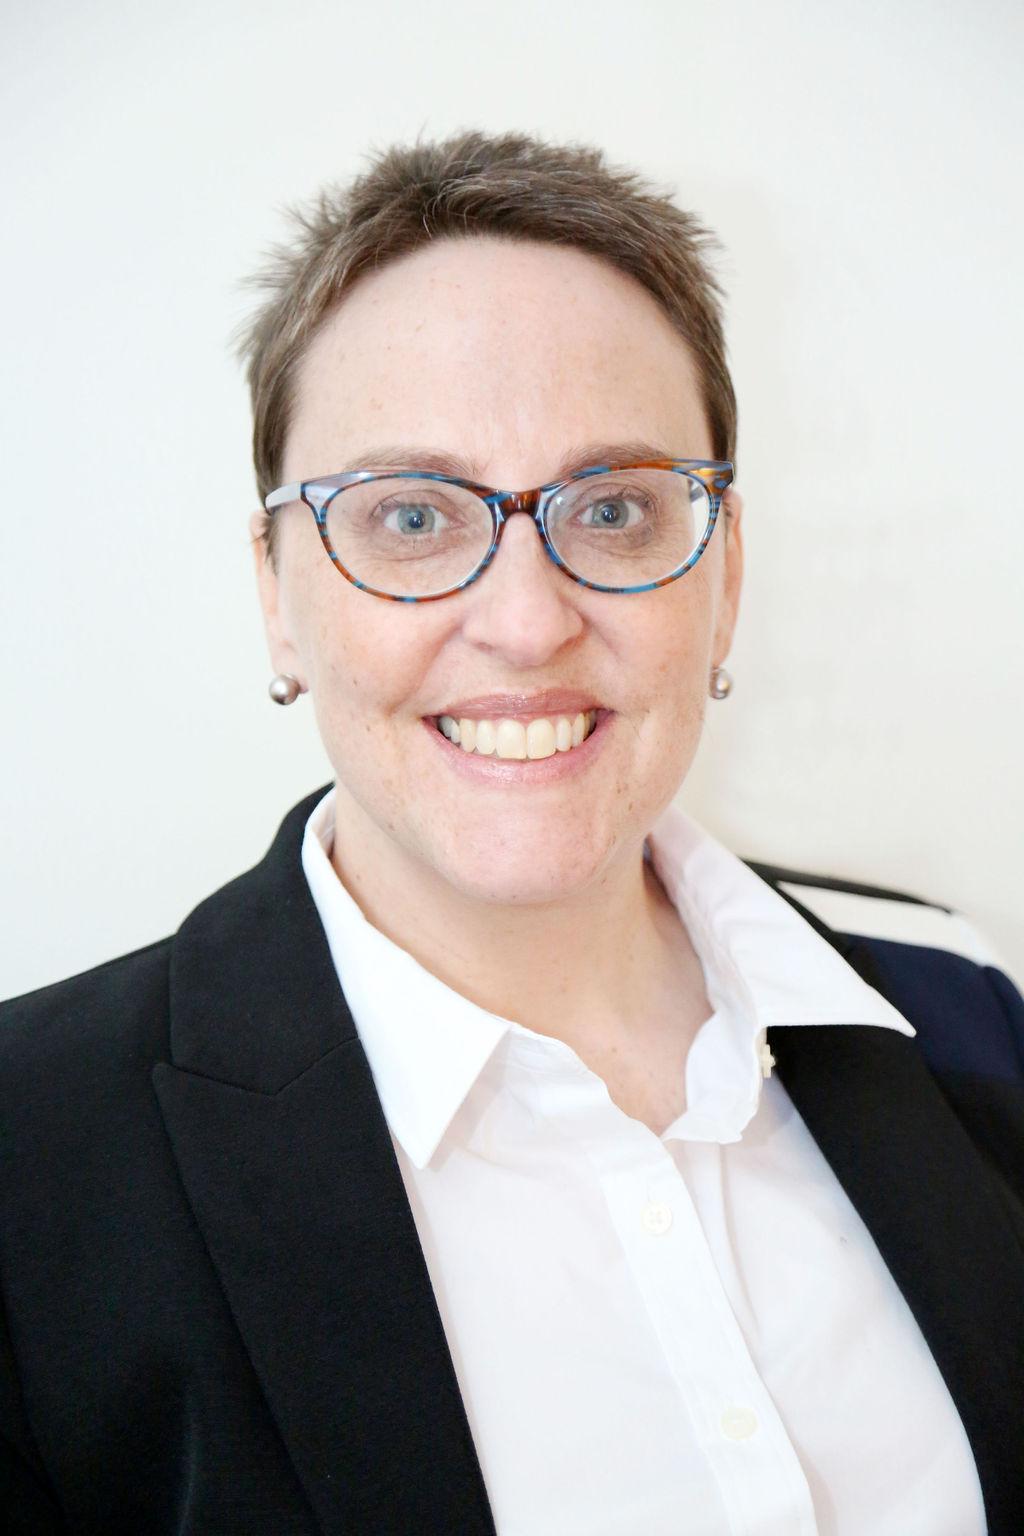 Wanda Deschamps, founder of Liberty Co.